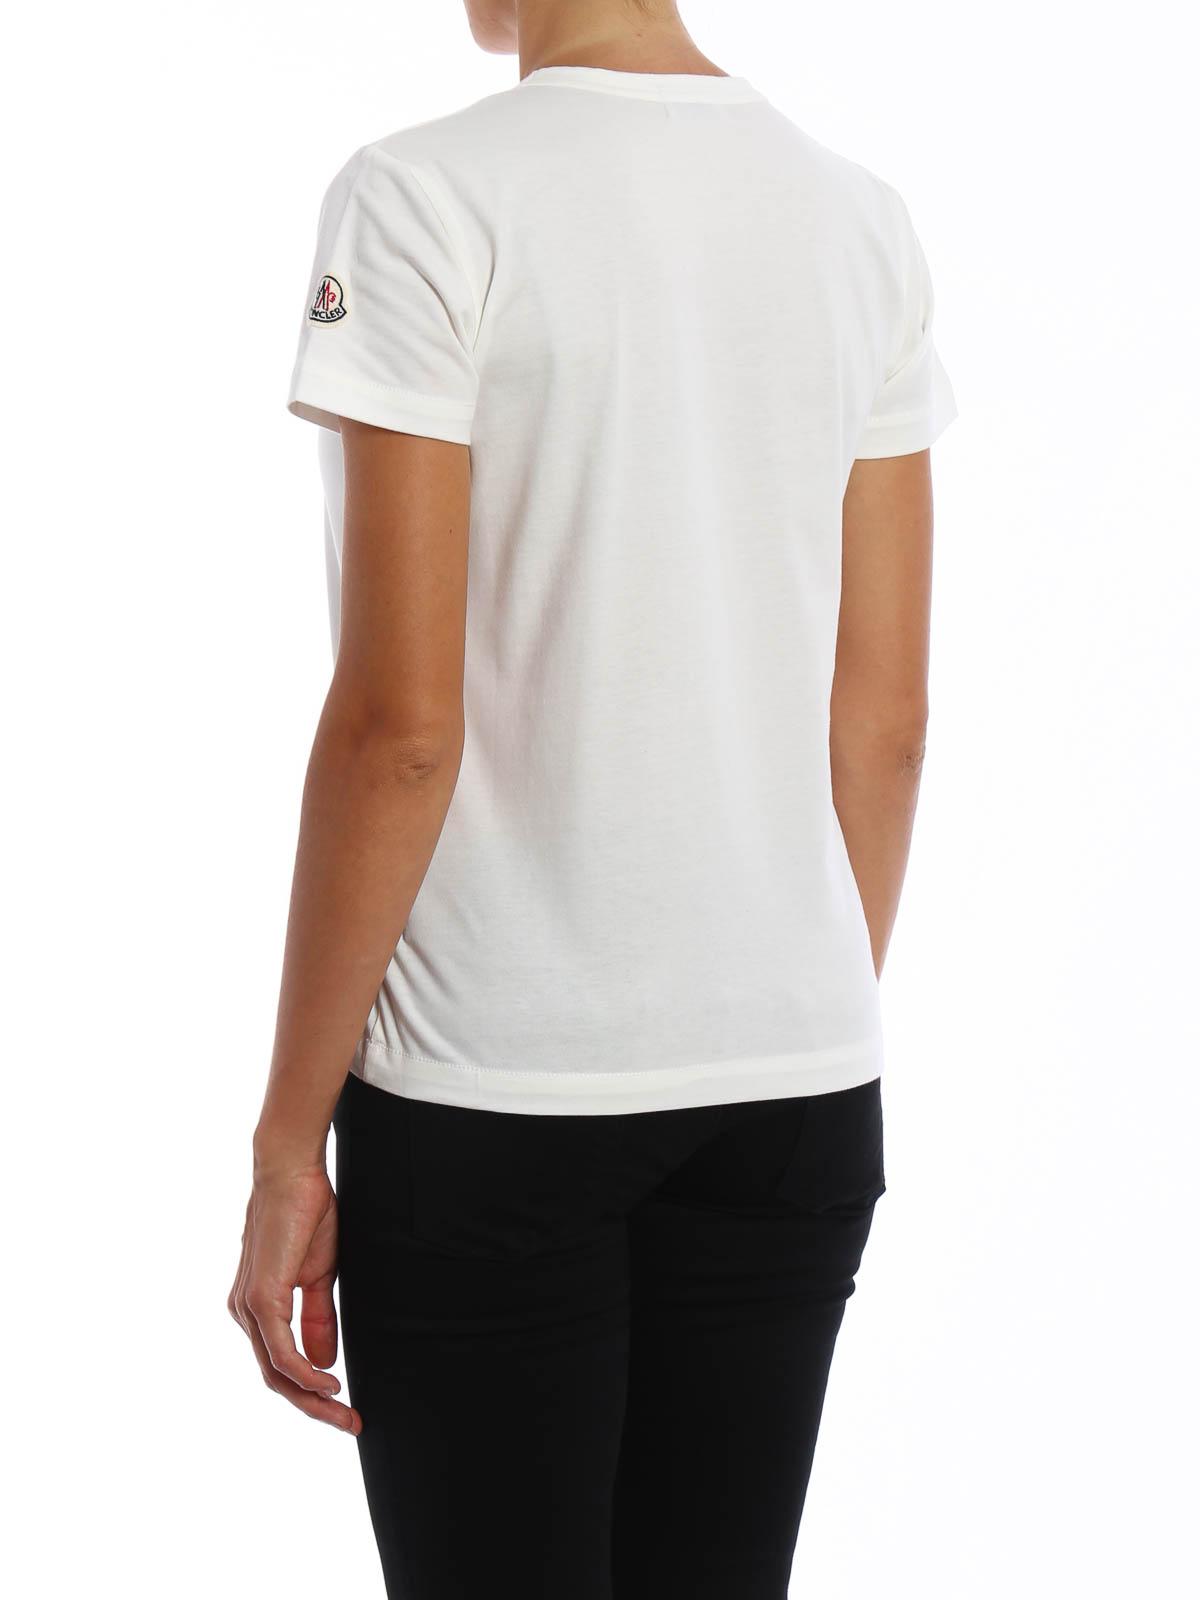 sports shoes 4d7c0 18580 Moncler - T-Shirt Fur Damen - Weiß - T-shirts - B2 096 ...